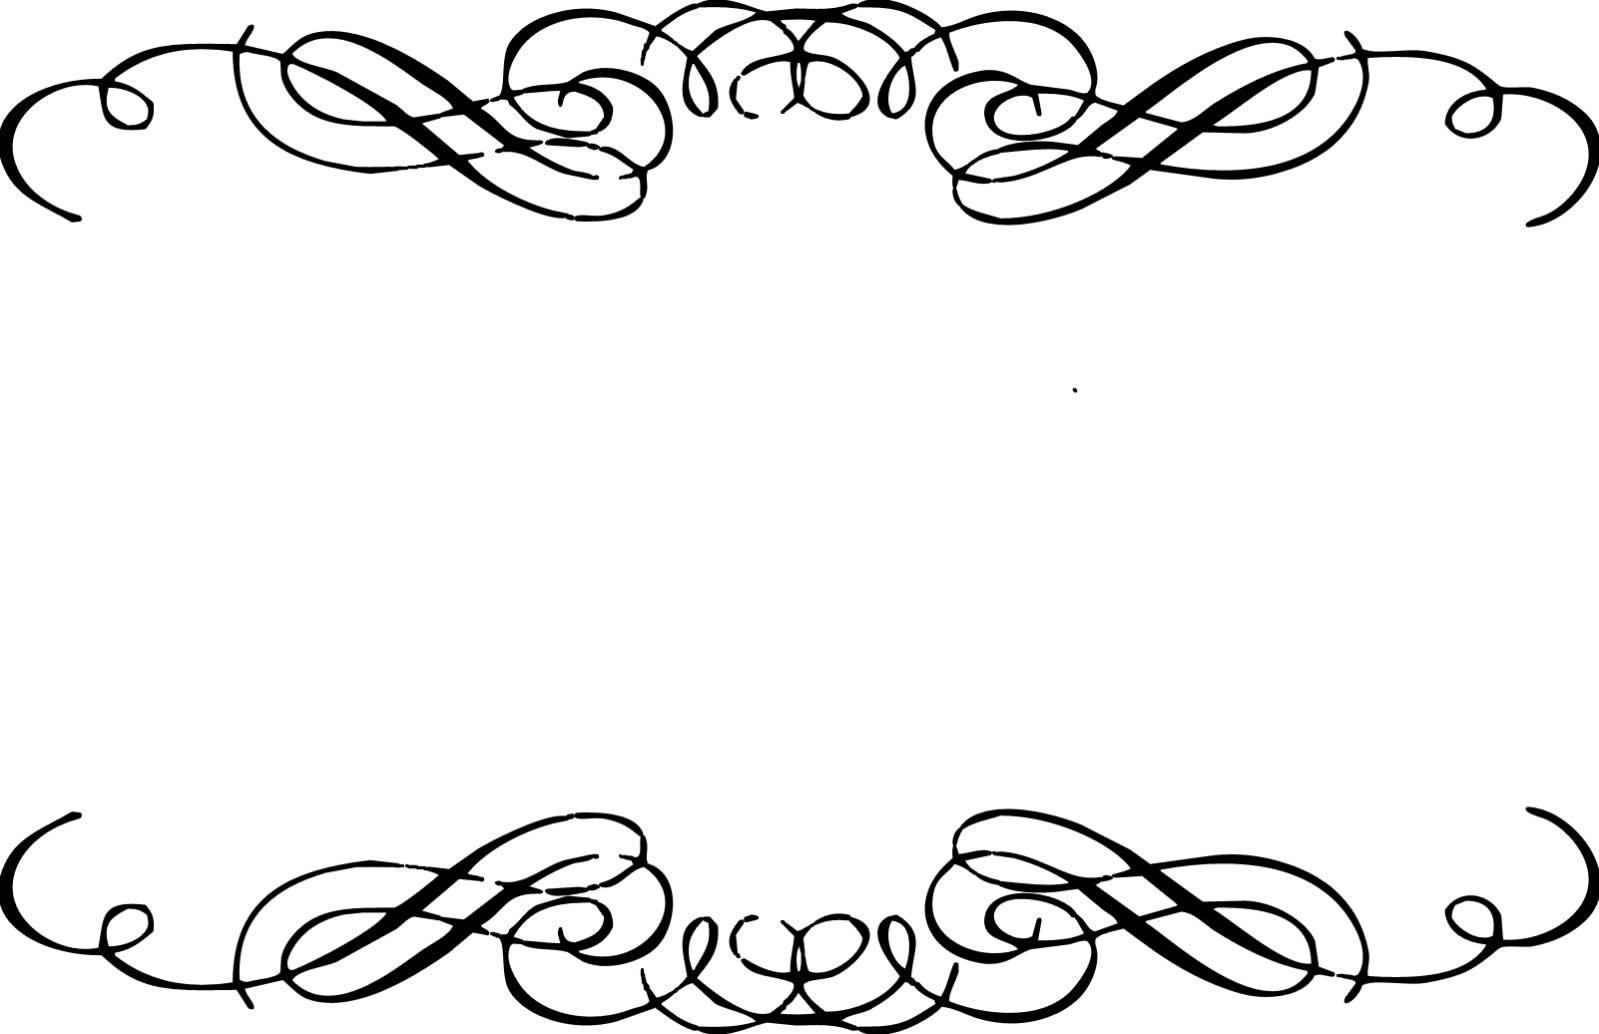 1599x1034 Funeral Clipart Fancy Line Accent